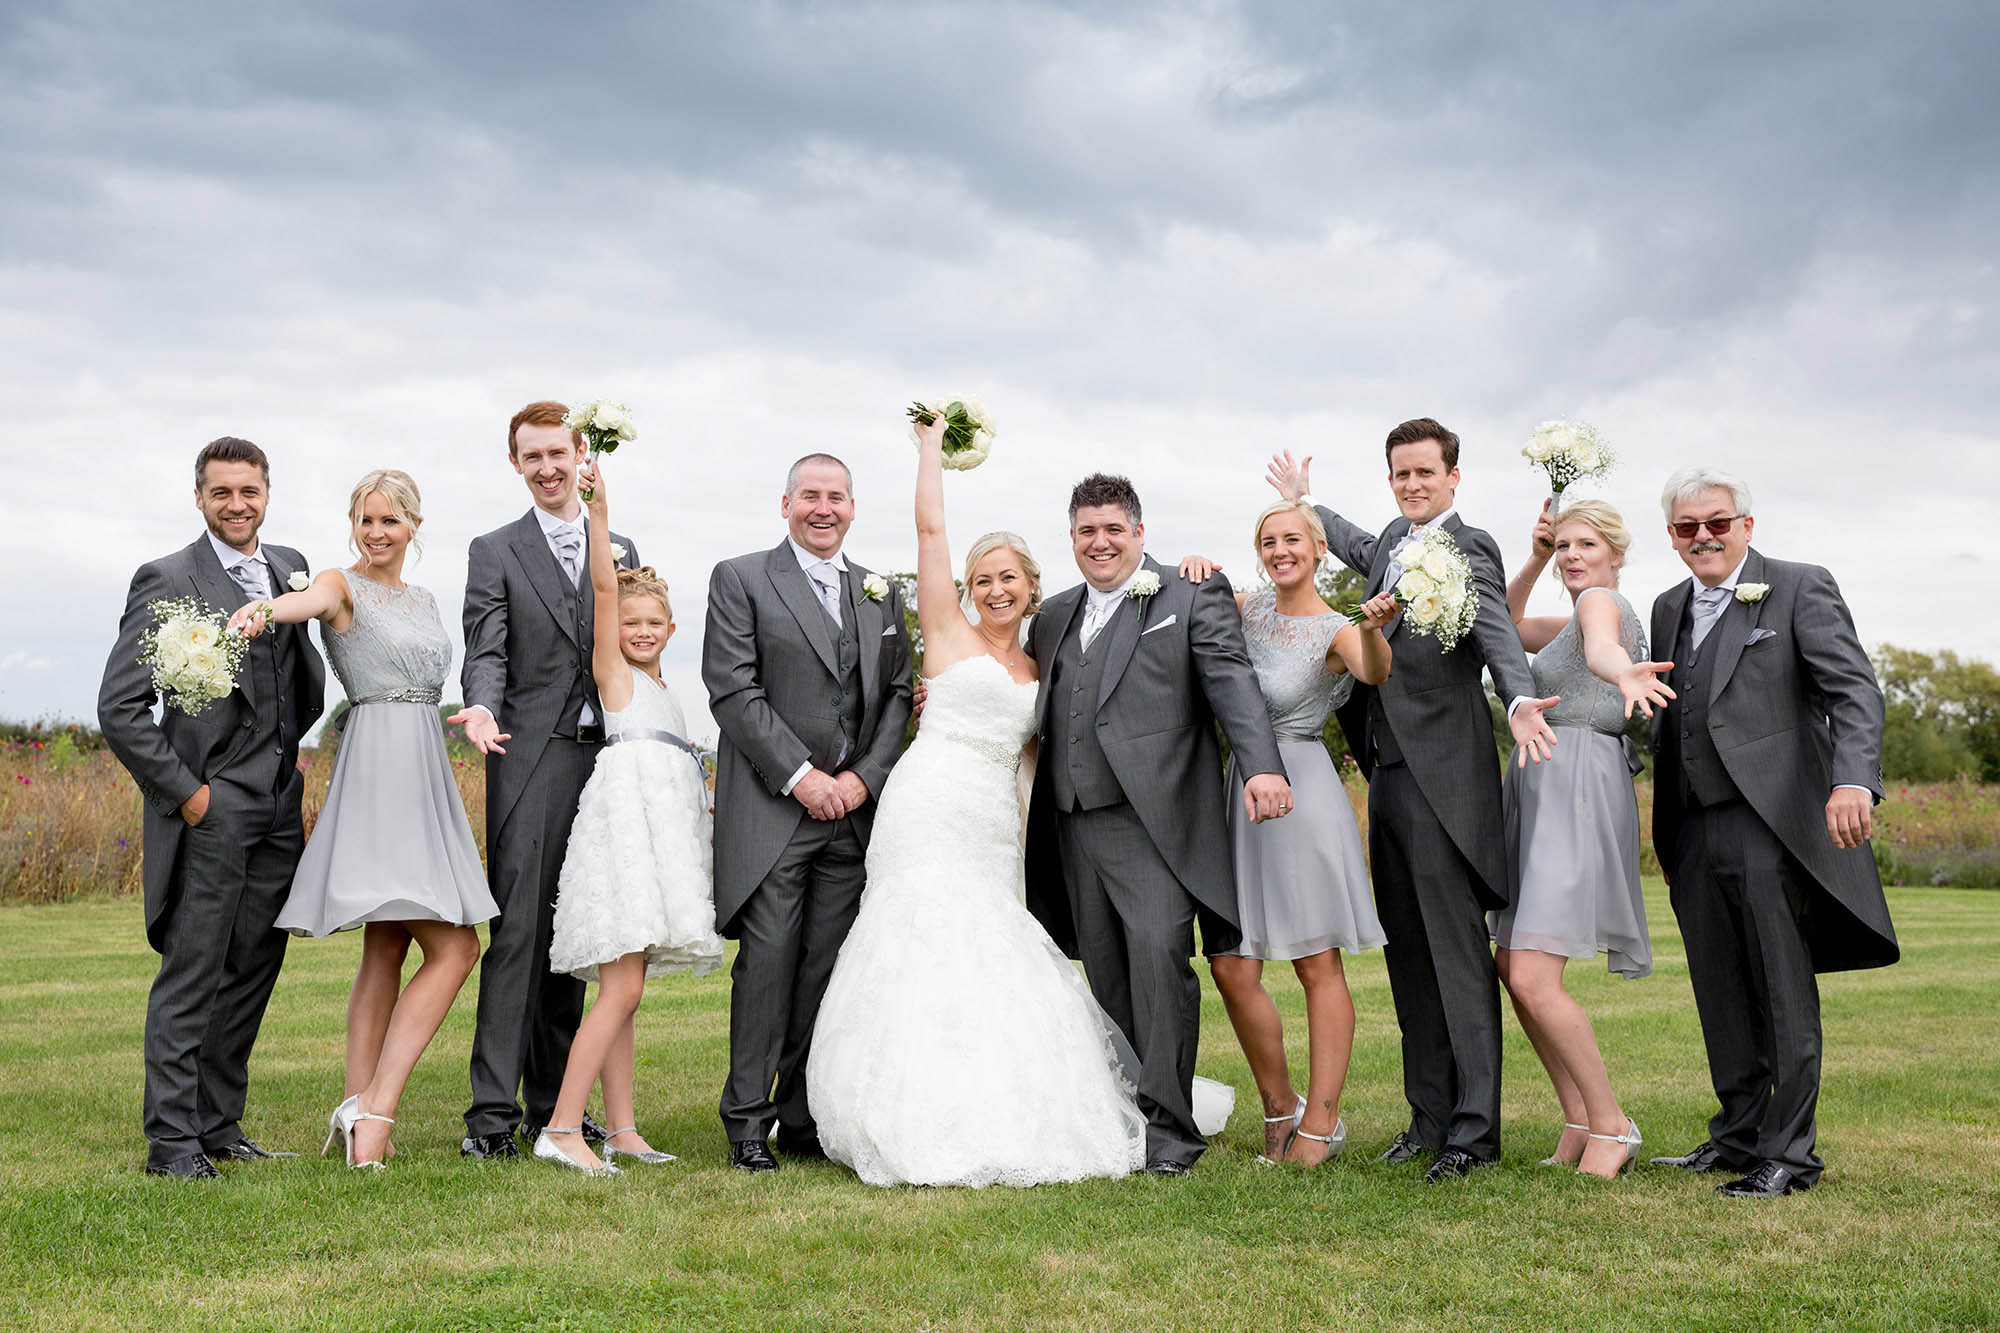 julia-toms-wedding-photographer-west-sussex-005.jpg